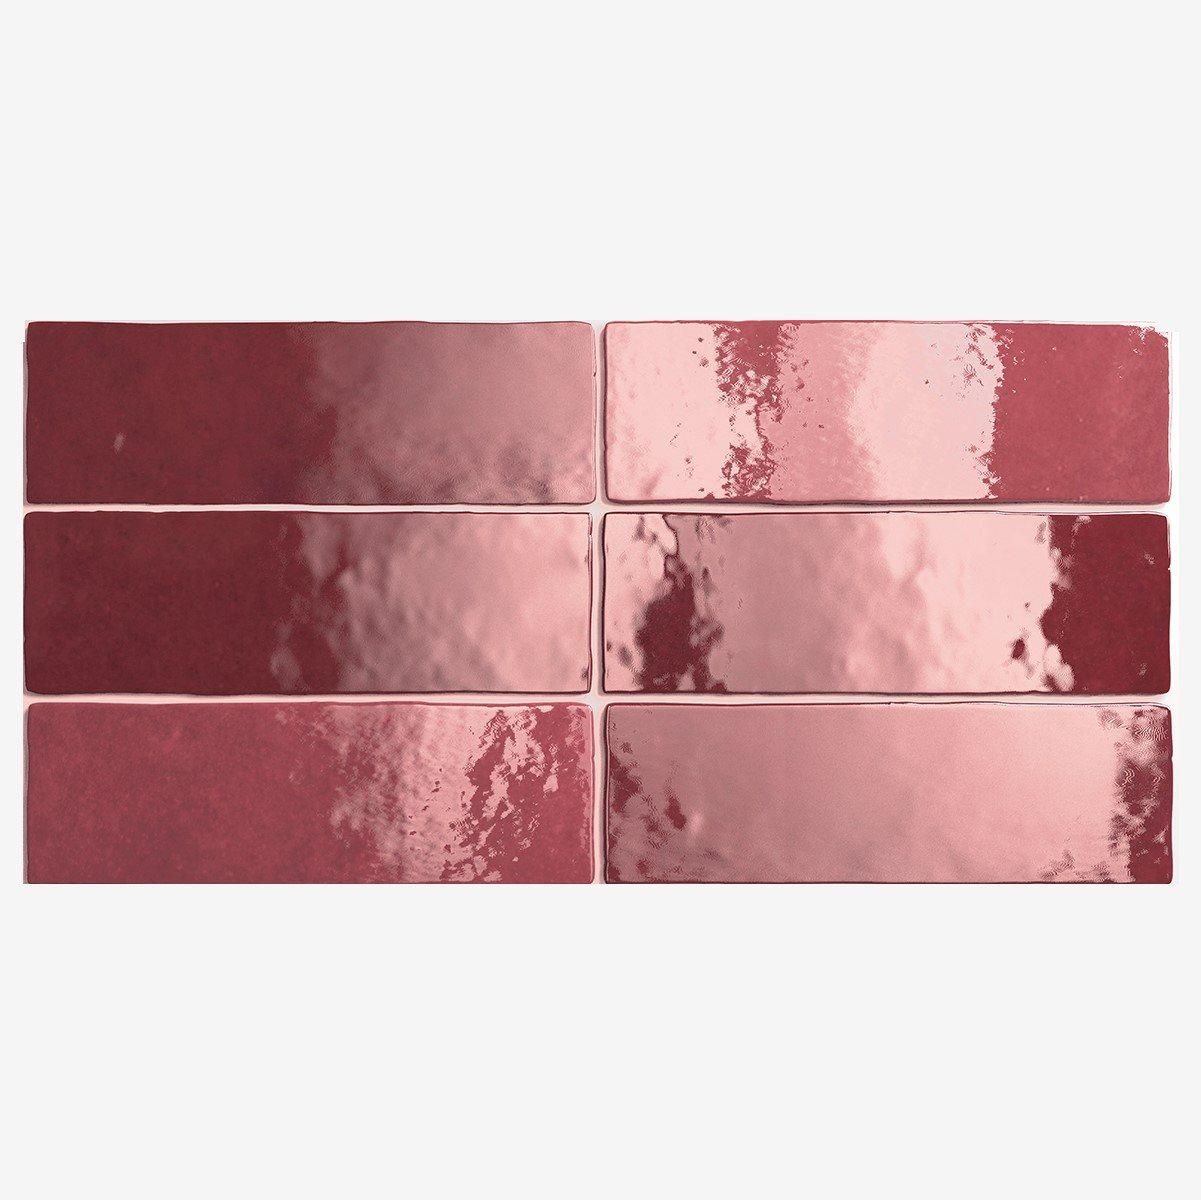 Carrelage effet zellige 6.5x20 ARTISAN ROUGE BURGUNDY 24467 - 0.5m² - zoom